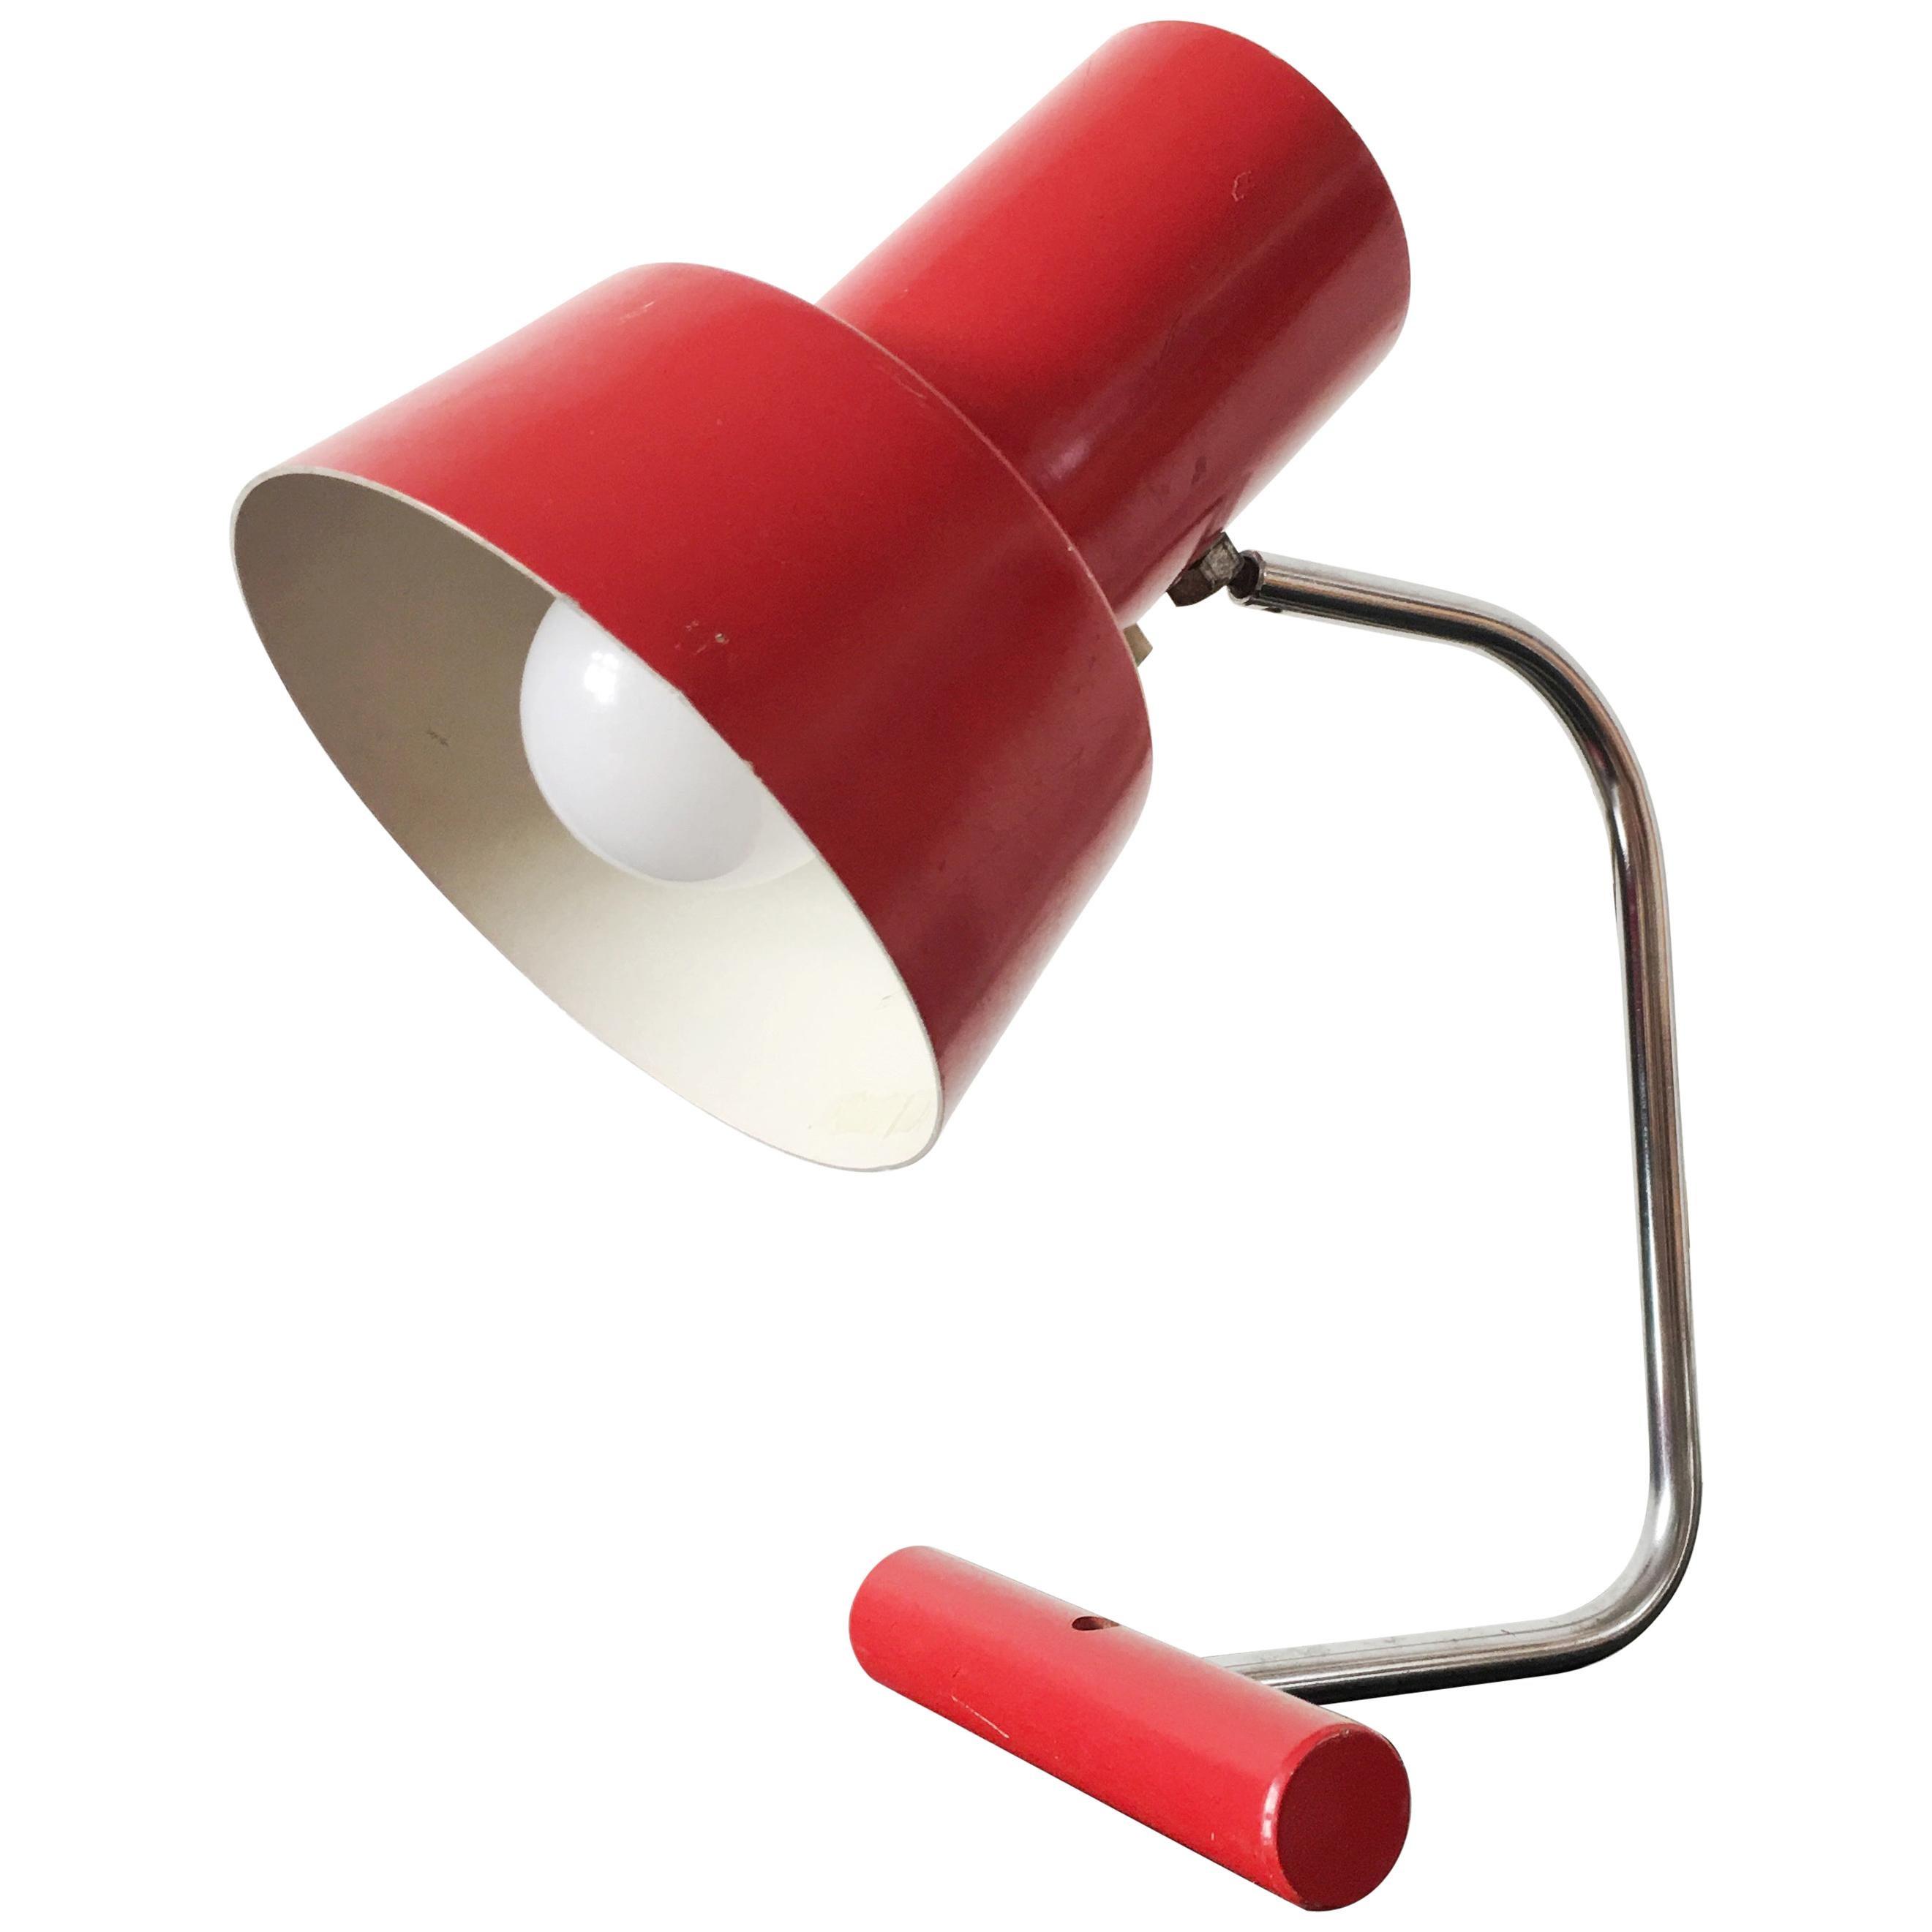 For Napako1960s Lamp By Hurka Table Josef JcTF3luK1